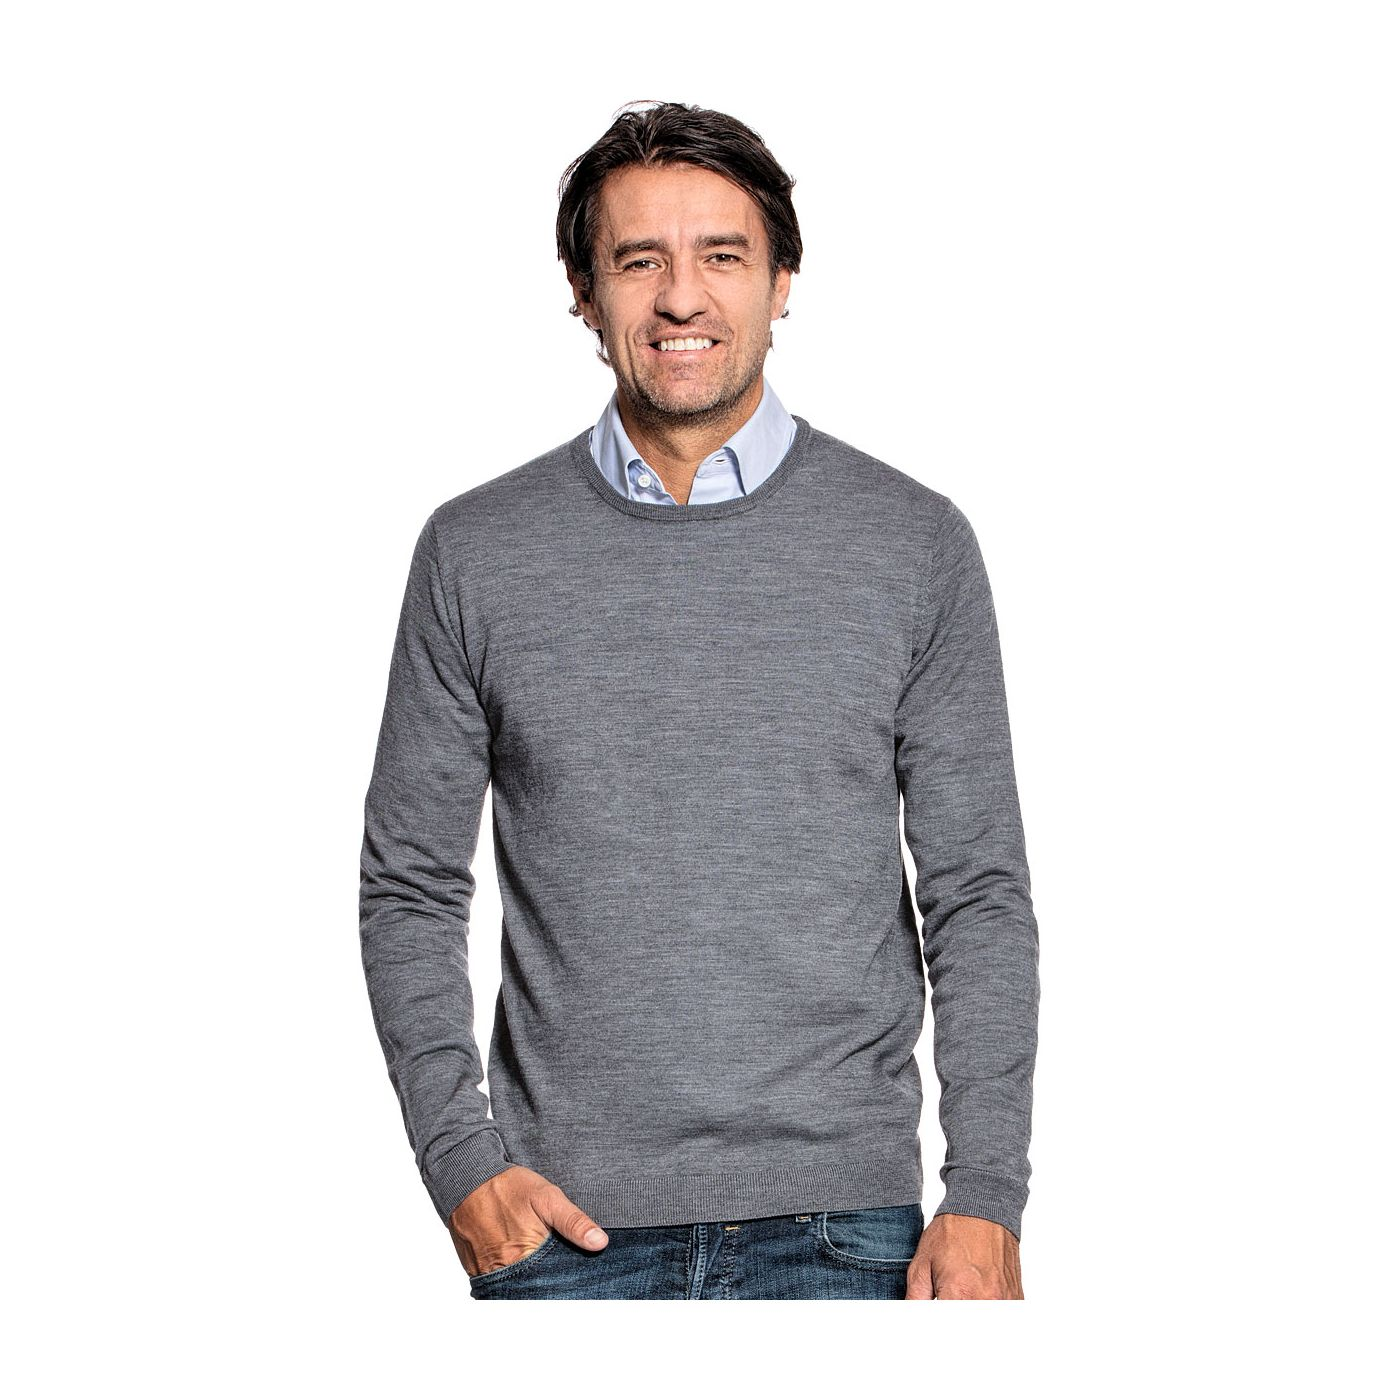 Crew neck sweater for men made of Merino wool in Grey